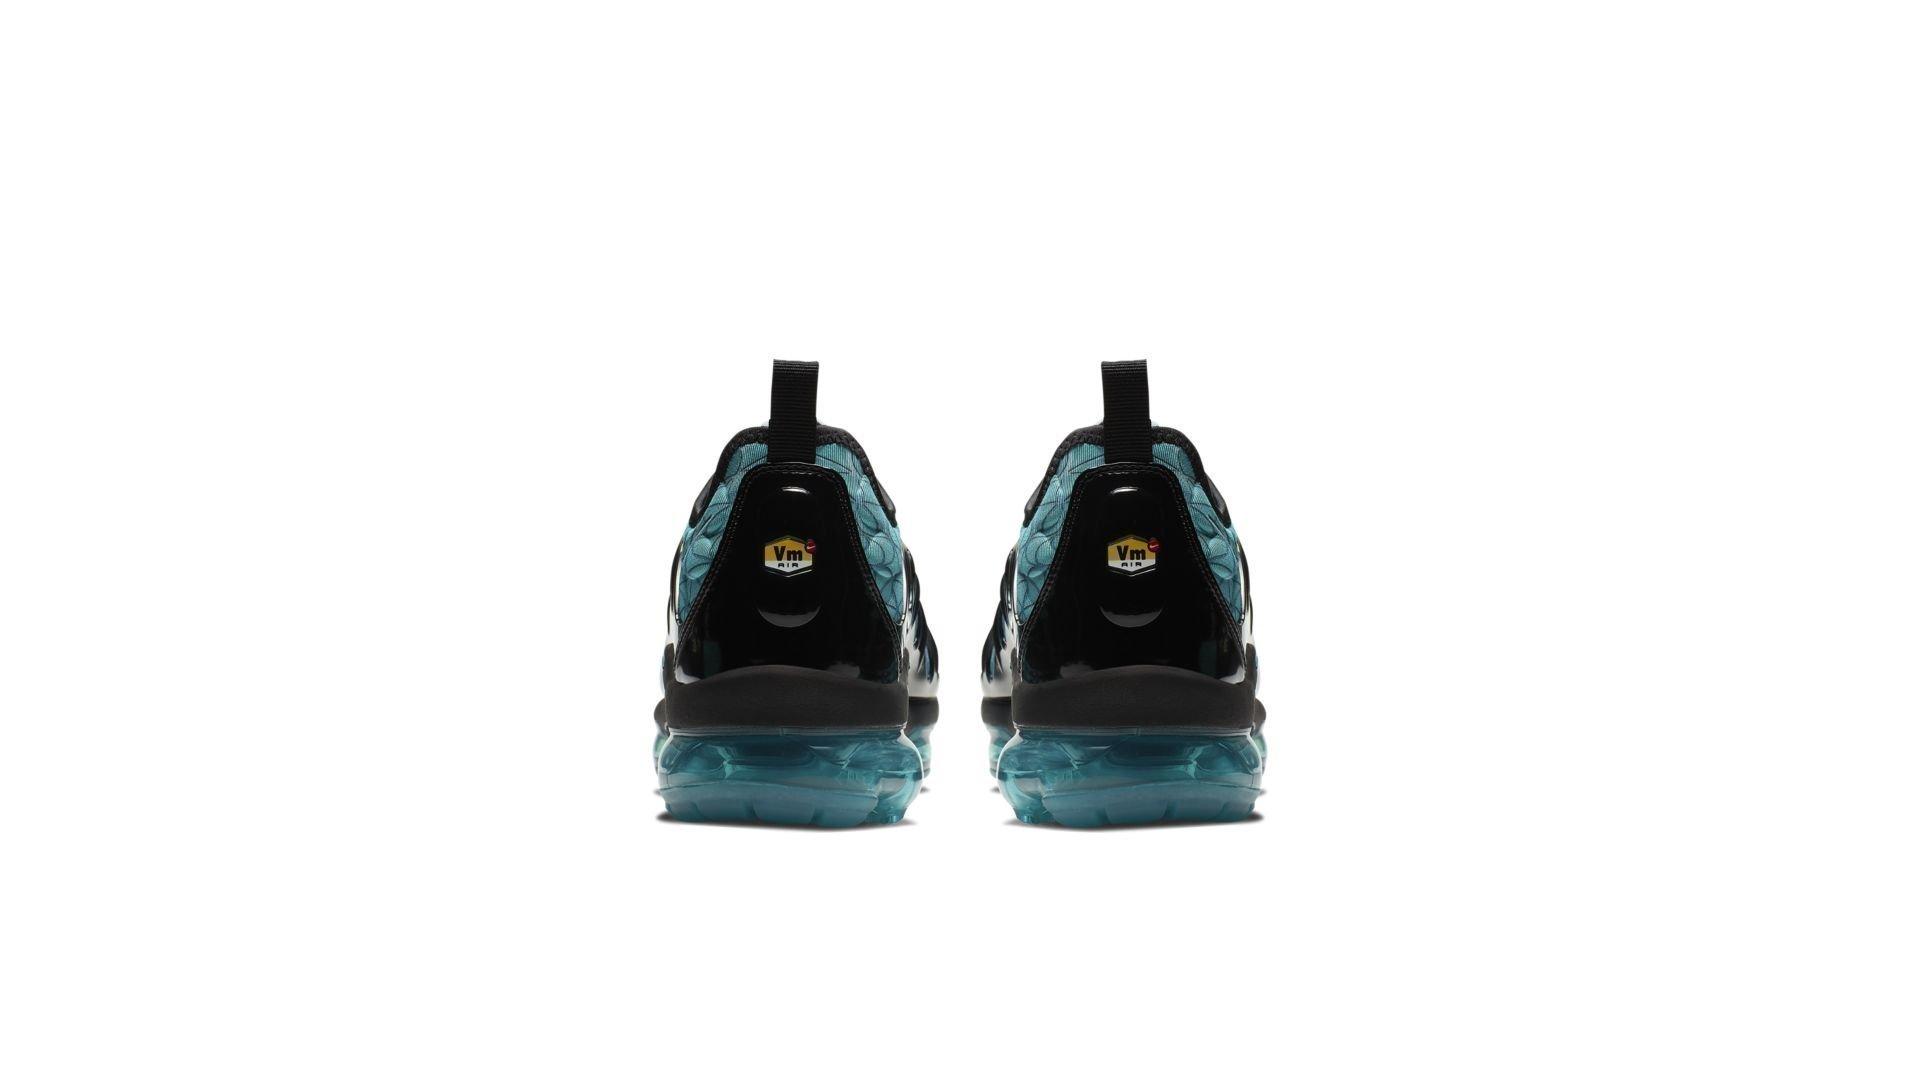 Nike Air VaporMax Plus Spirit Teal (924453-301)